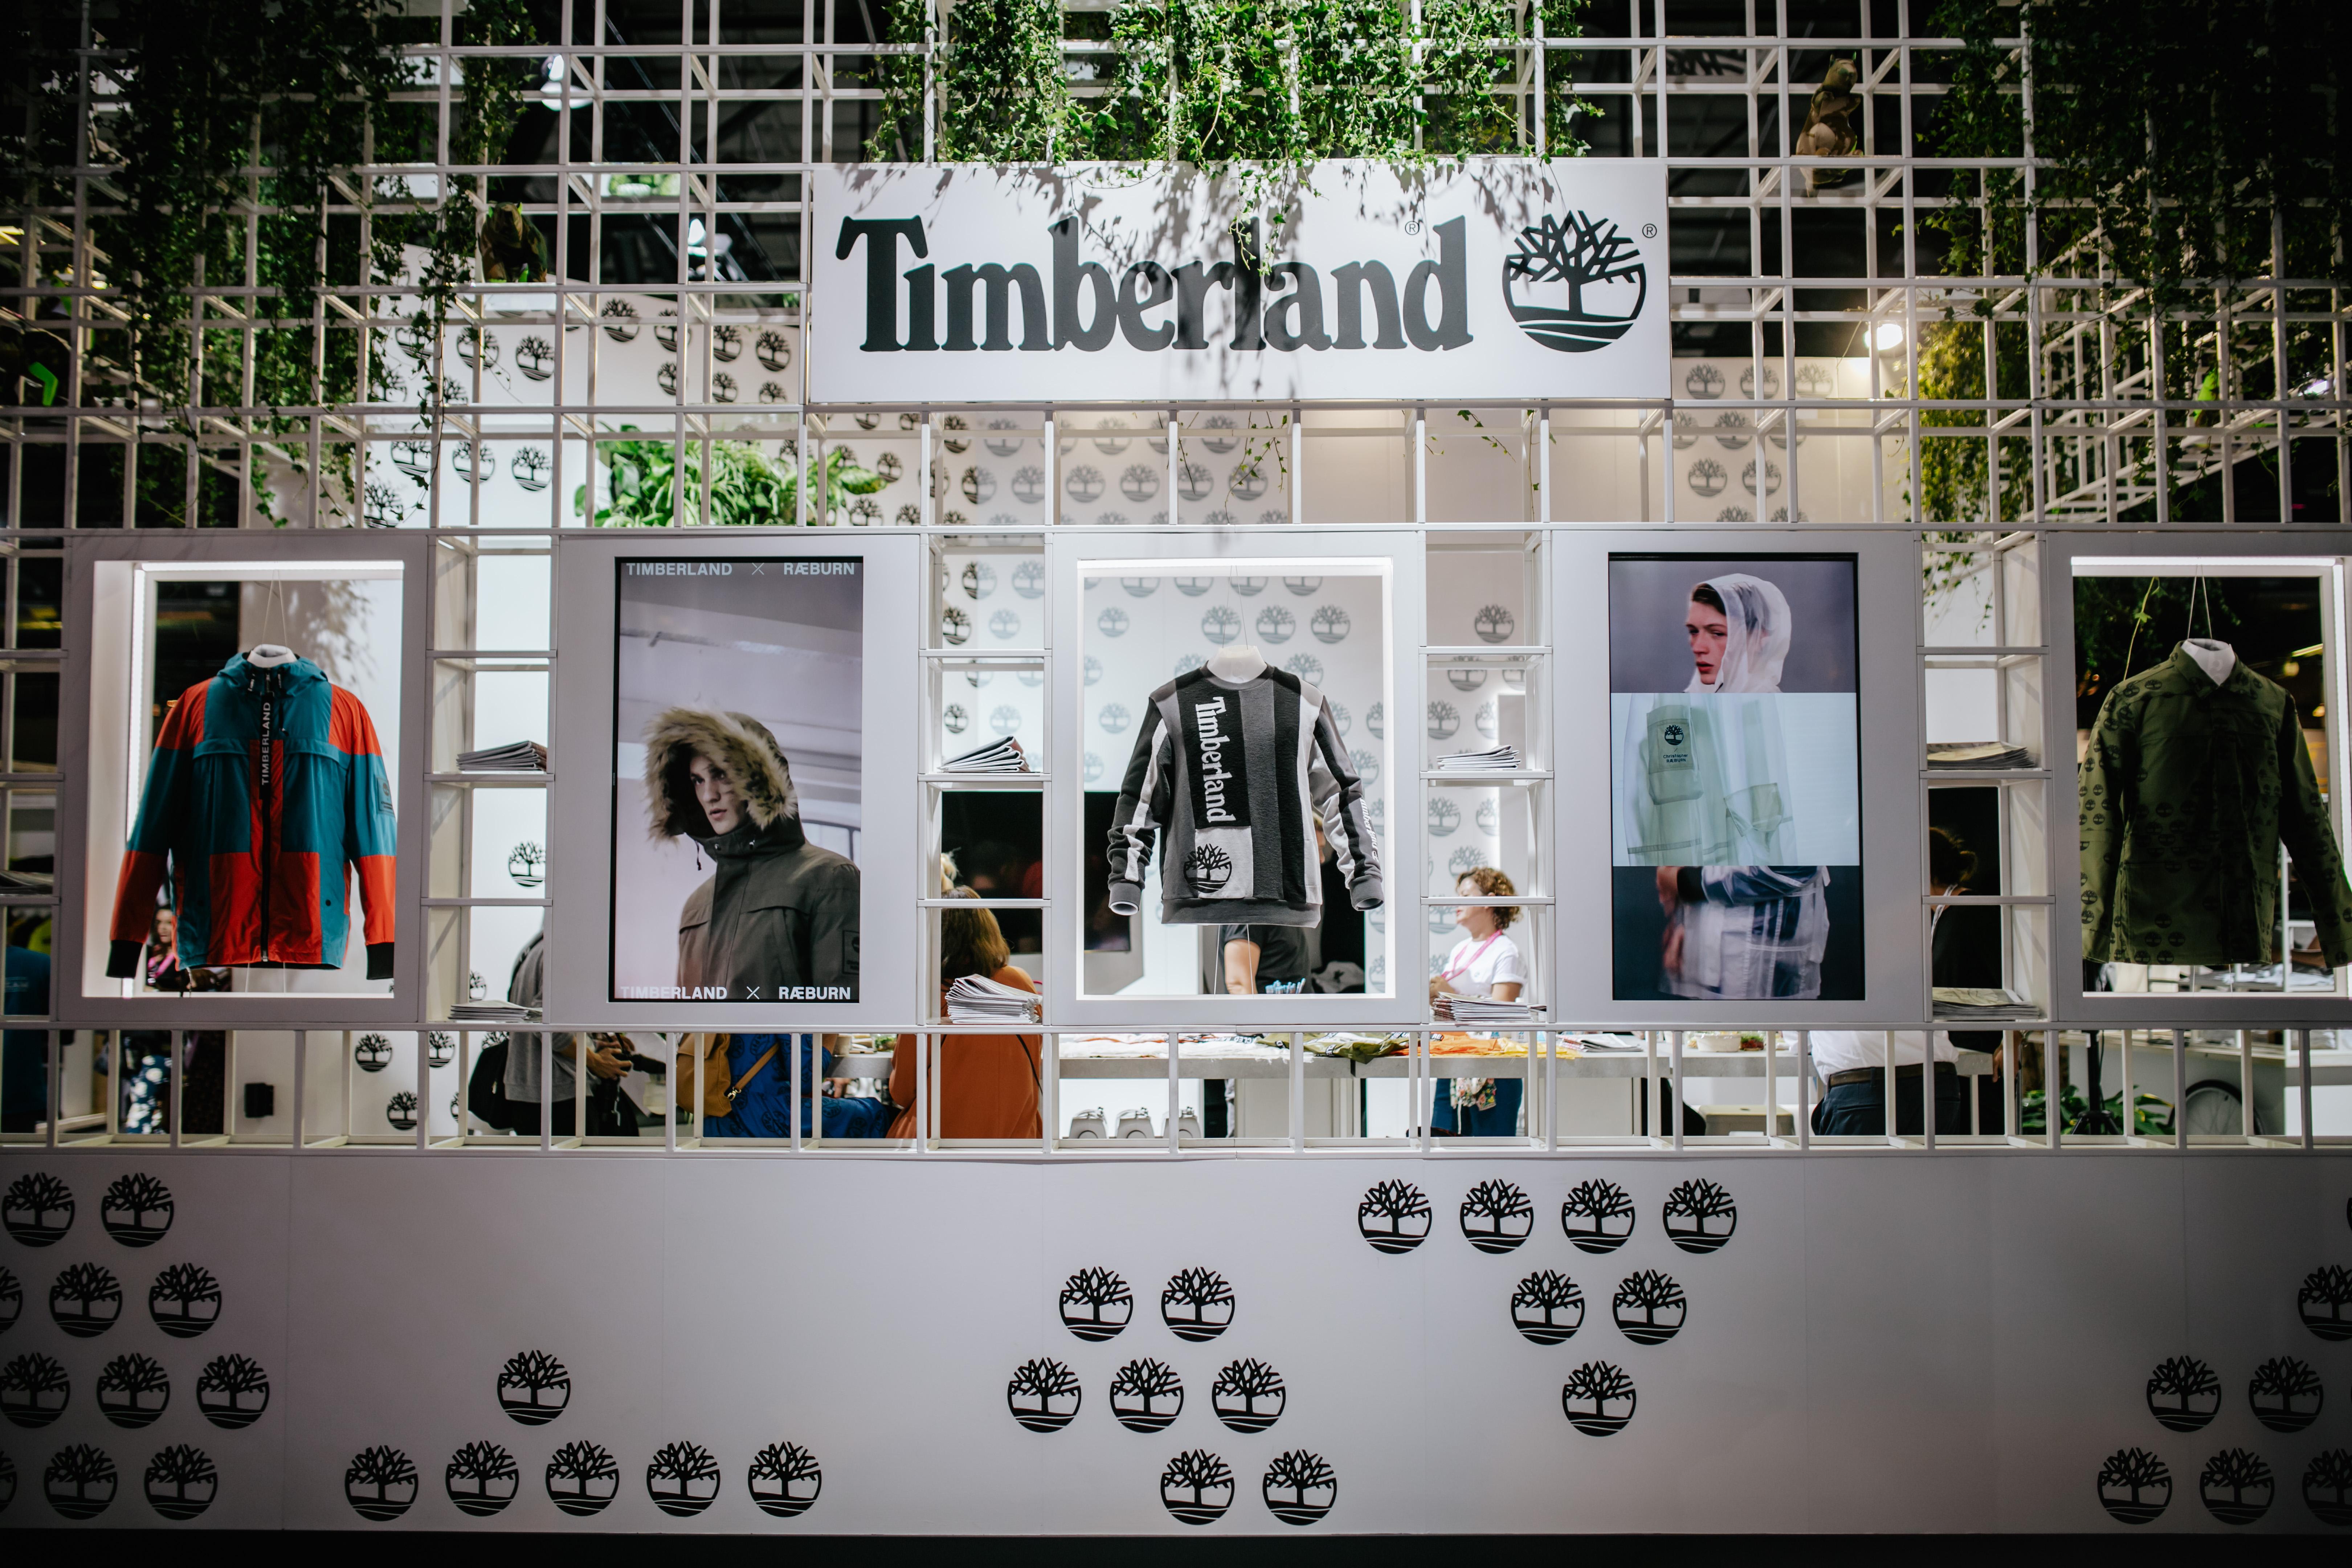 Bread&&Butter by Zalando 2018 - Day 1 Timberland 1